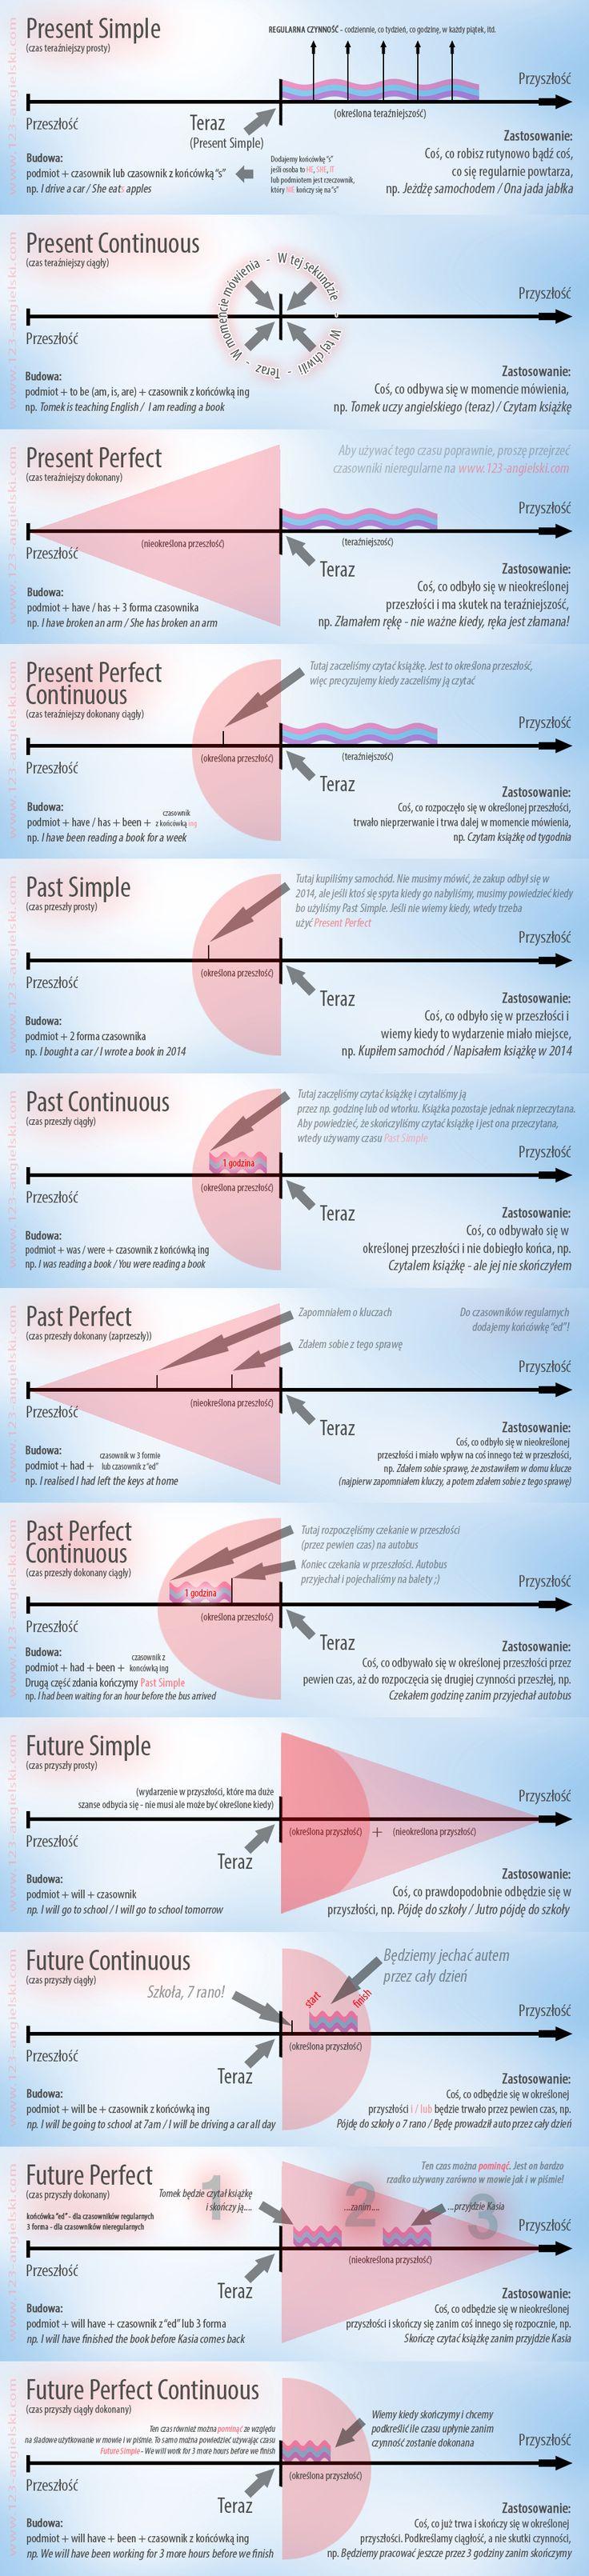 Zestawienie czasow angielskich, present simple, past simple, future simple, past continuous, present continuous